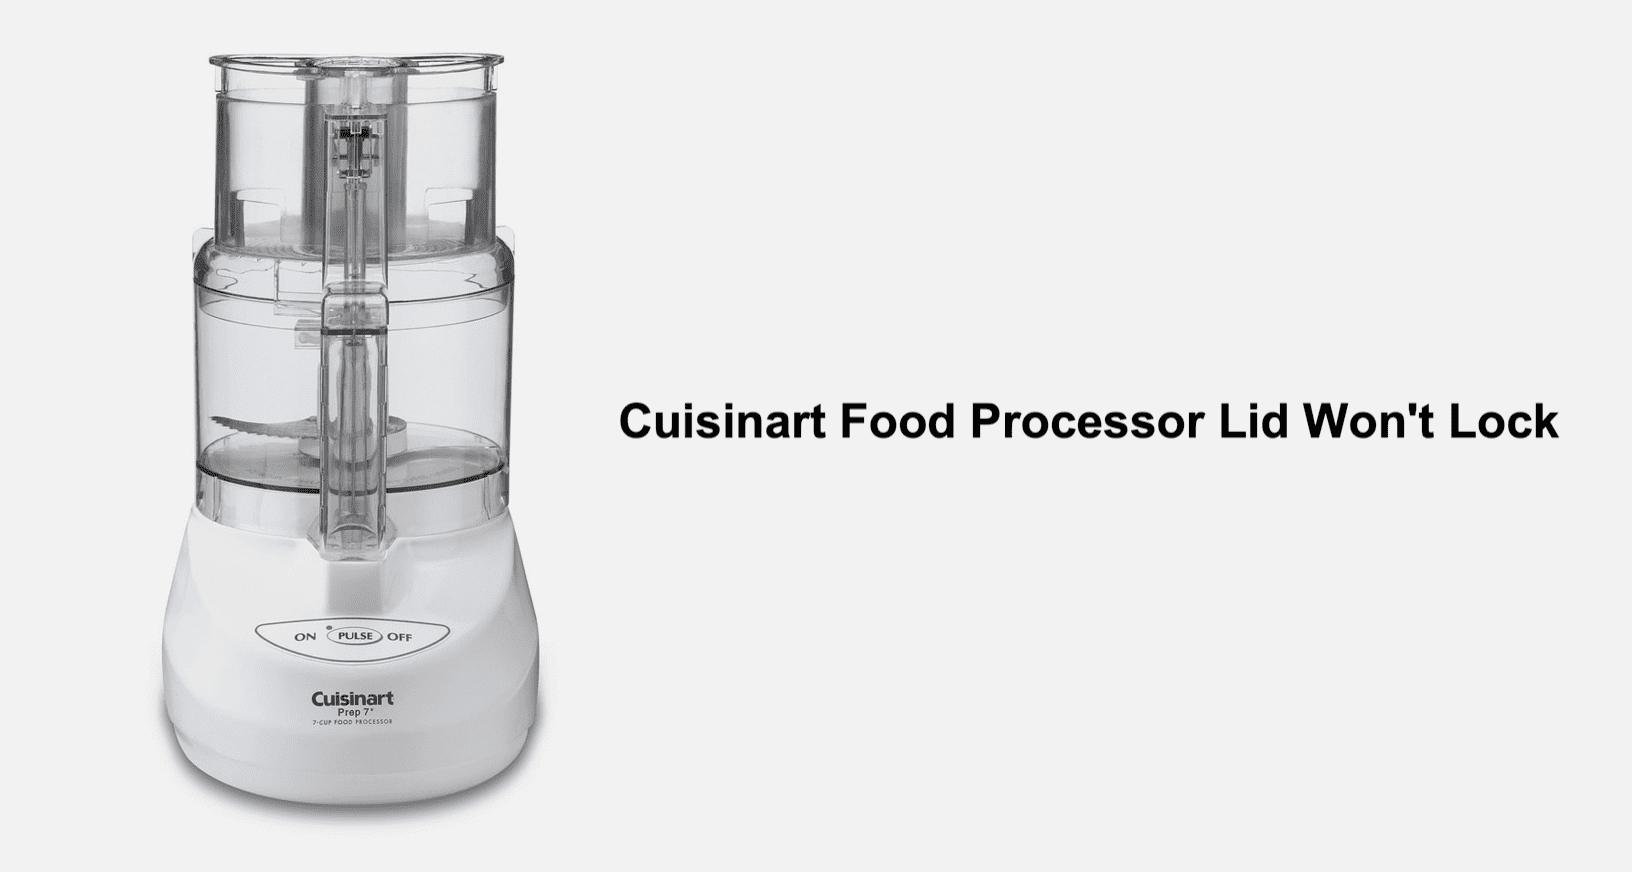 cuisinart food processor lid won't lock